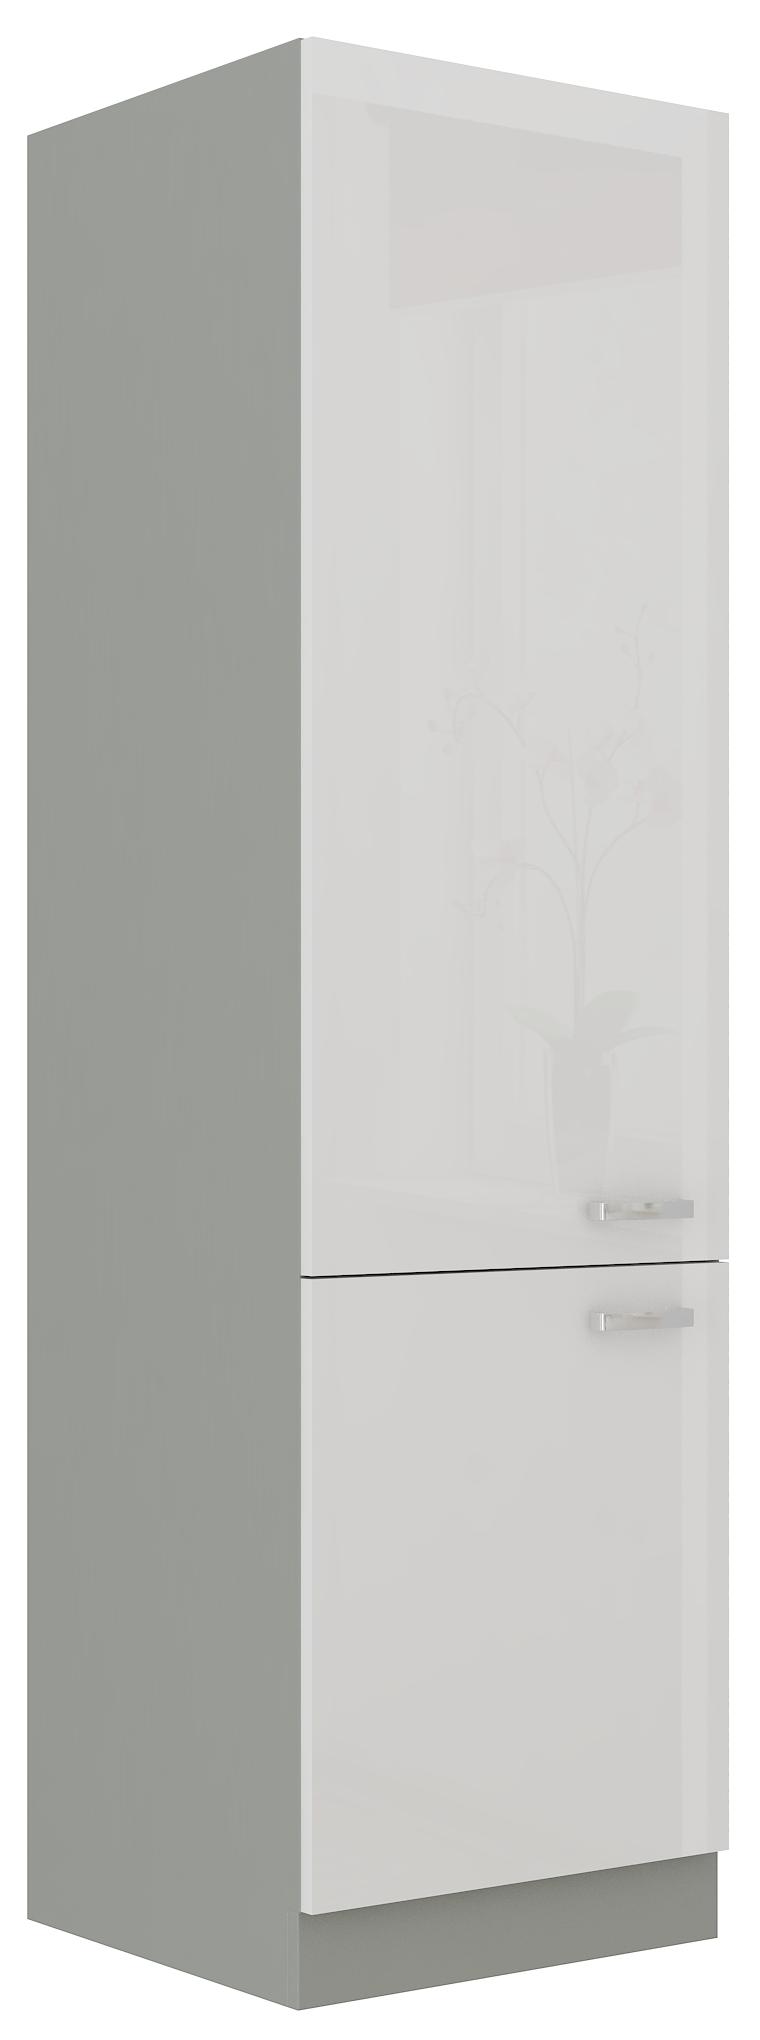 Kühlschrankumbauschrank 60 cm / 210 cm Bianca